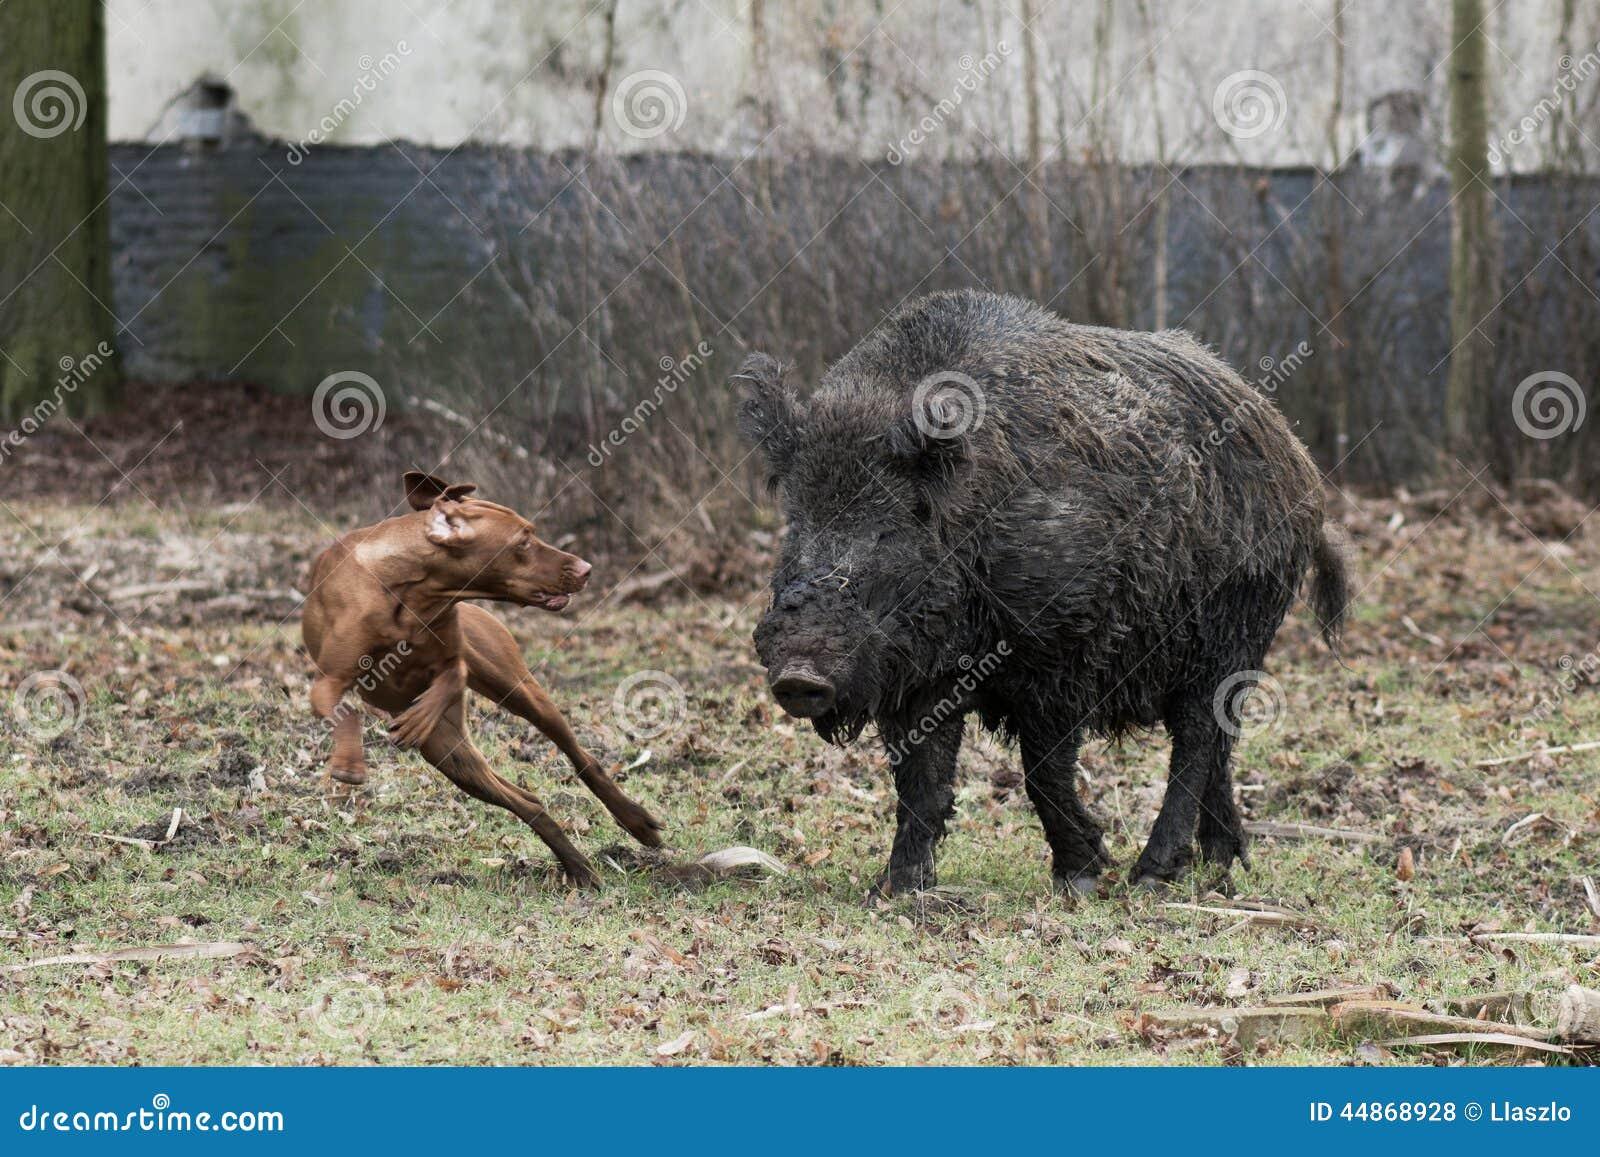 Hunting Dog Chasing Wild Boar Stock Photo - Image of scrofa